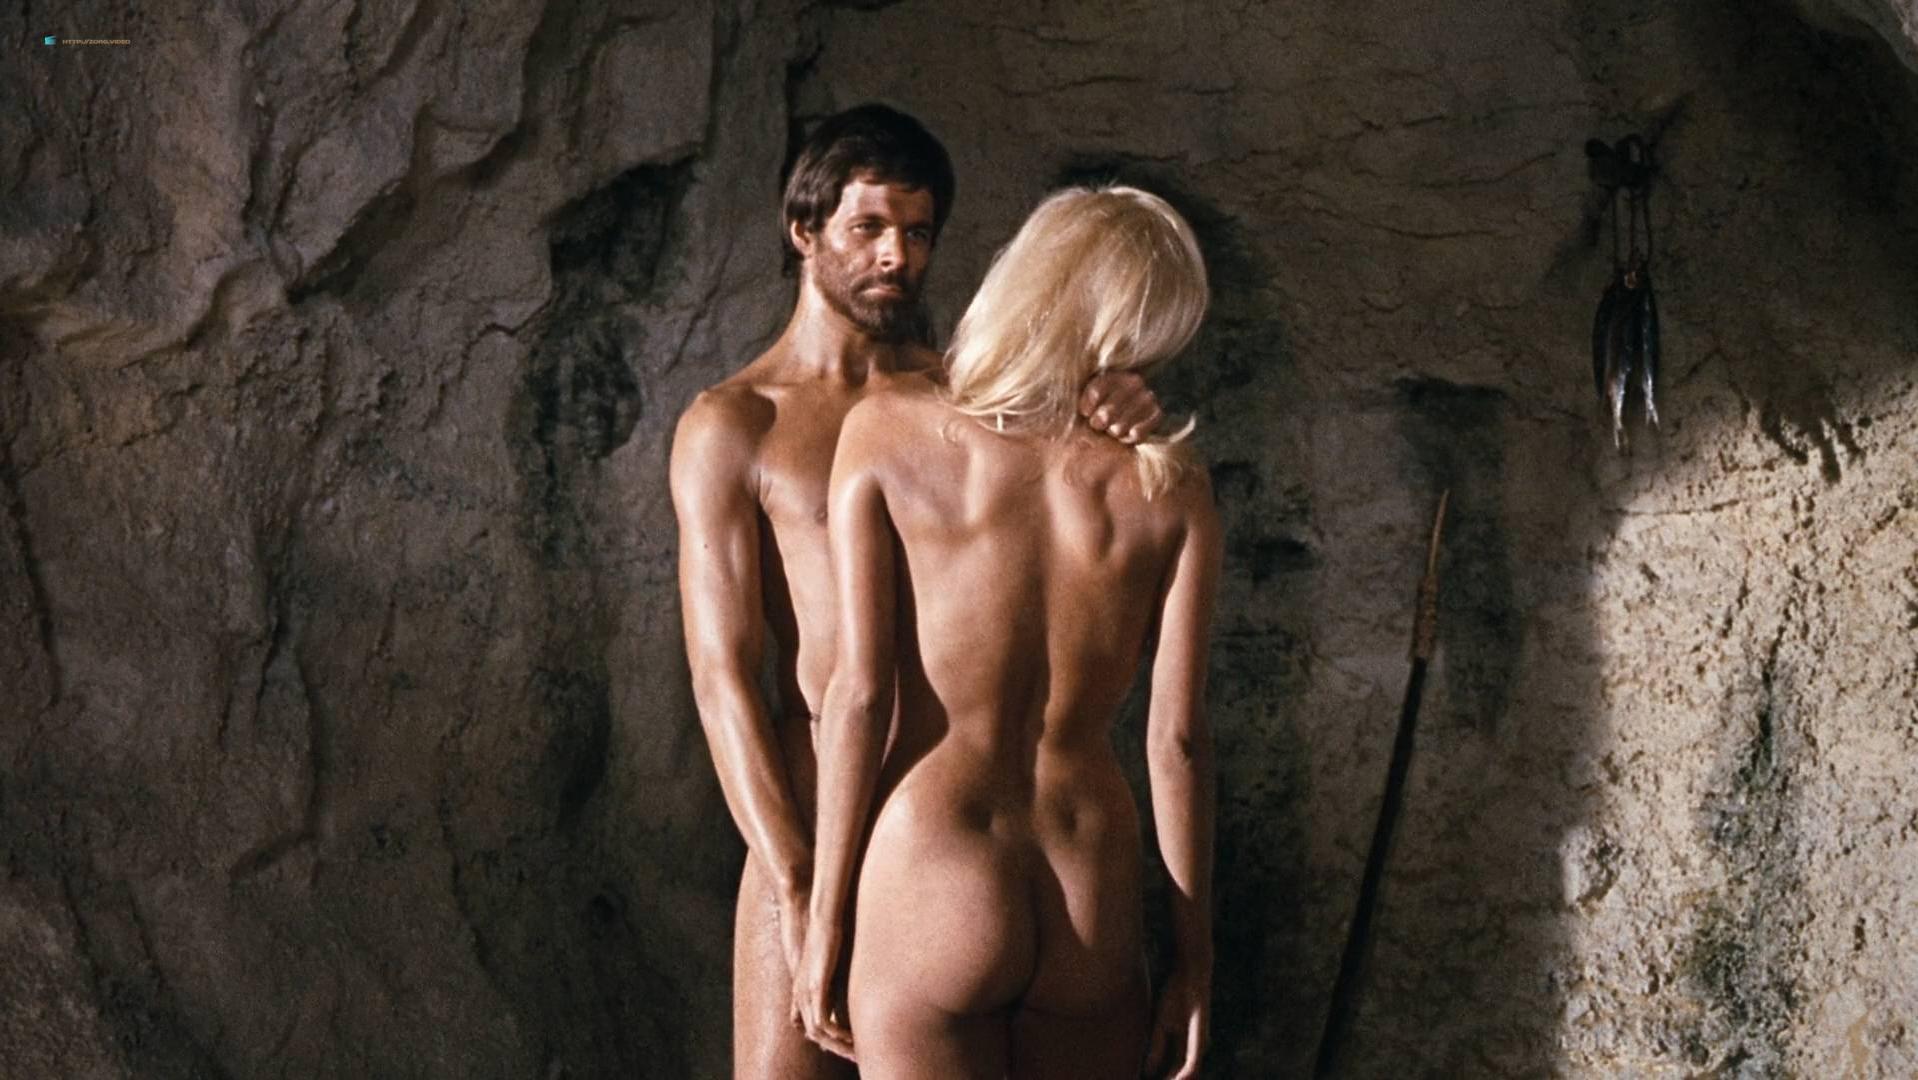 bruno-movie-nude-pics